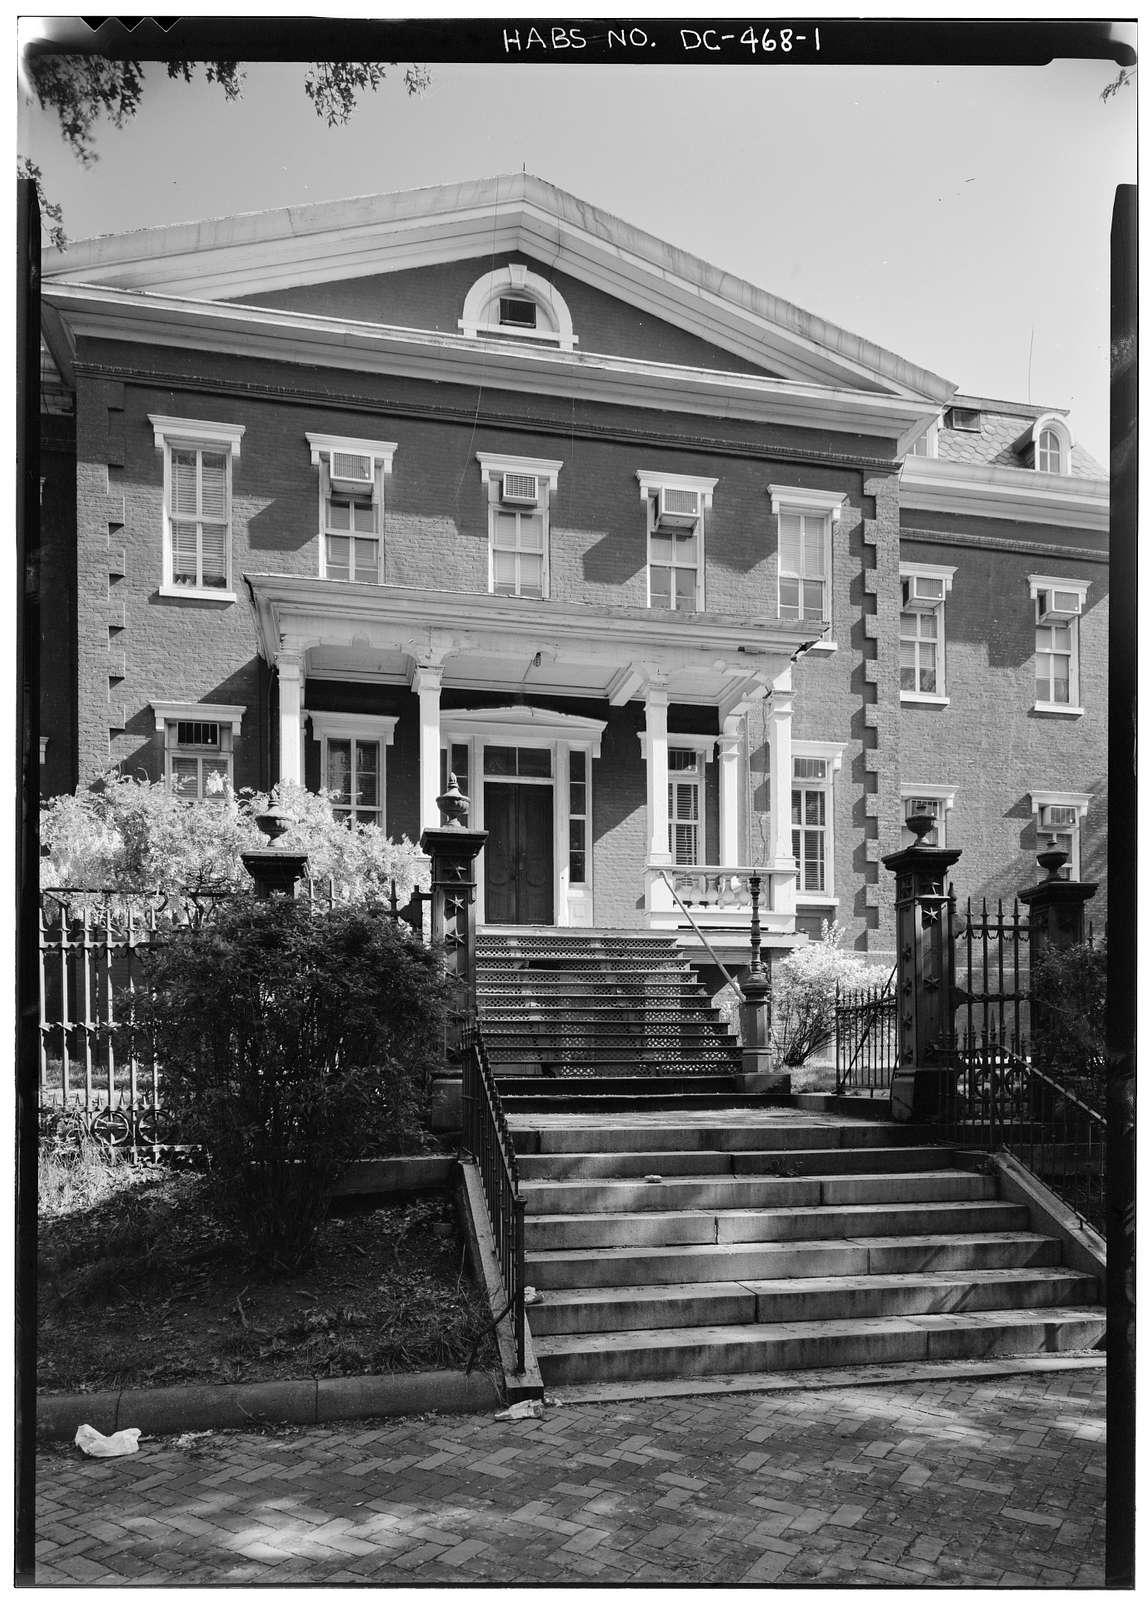 Old Naval Hospital, 921 Pennsylvania Avenue Southeast, Washington, District of Columbia, DC